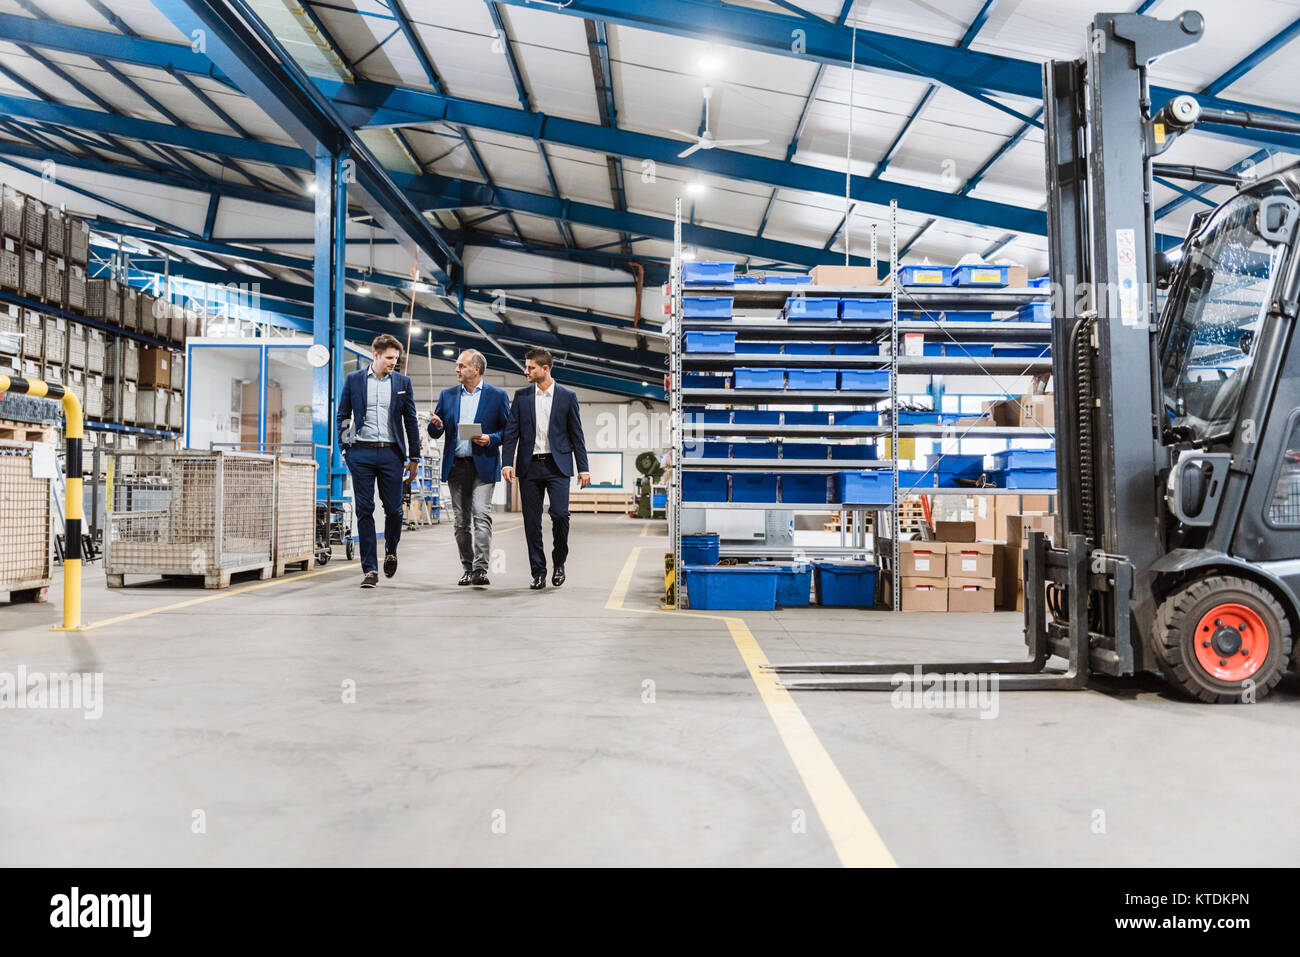 Three businessmen walking through shop floor, discussing decisions - Stock Image